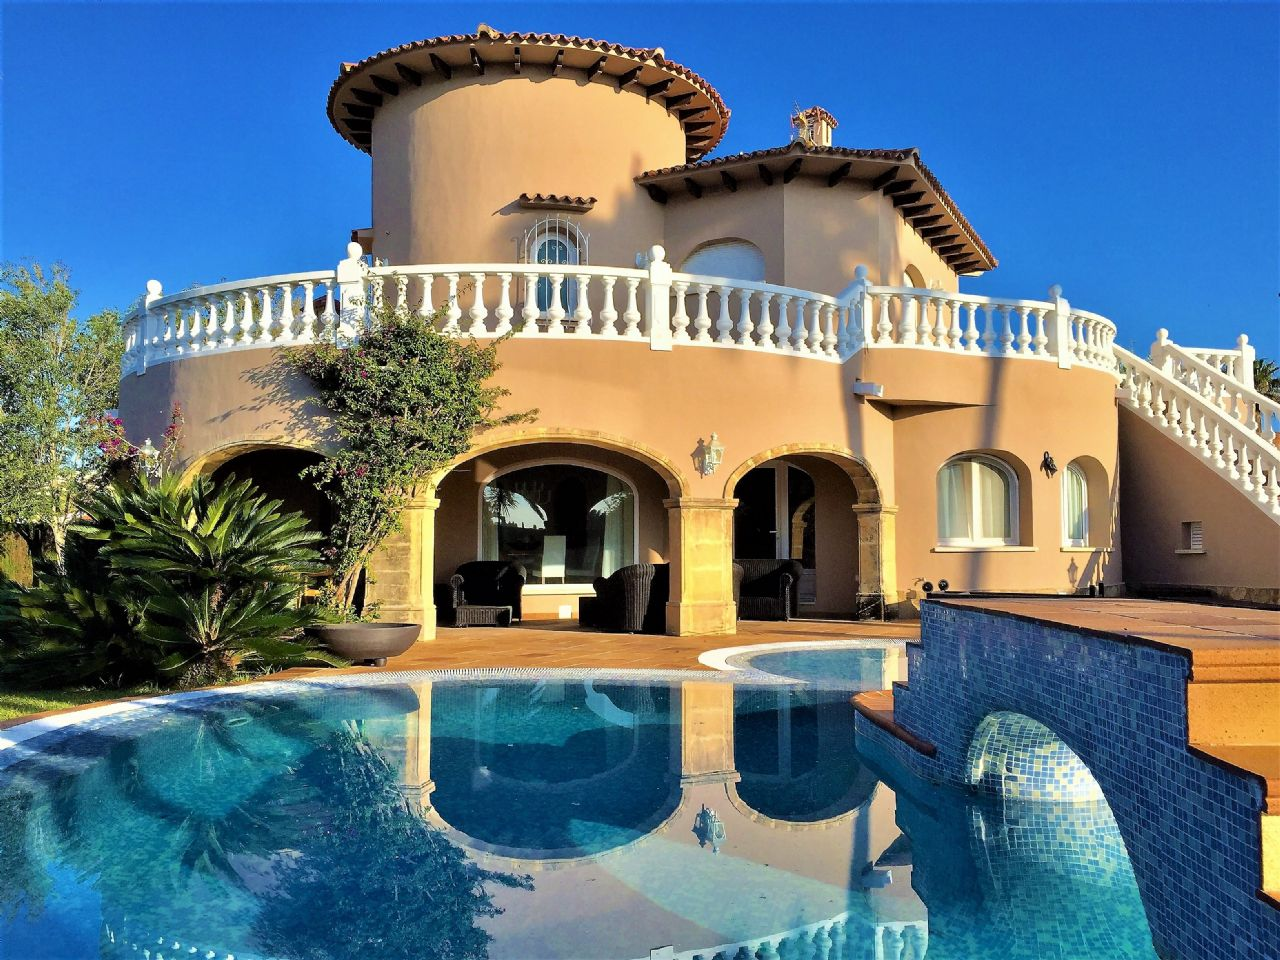 Villa de Lujo en Oliva, venta